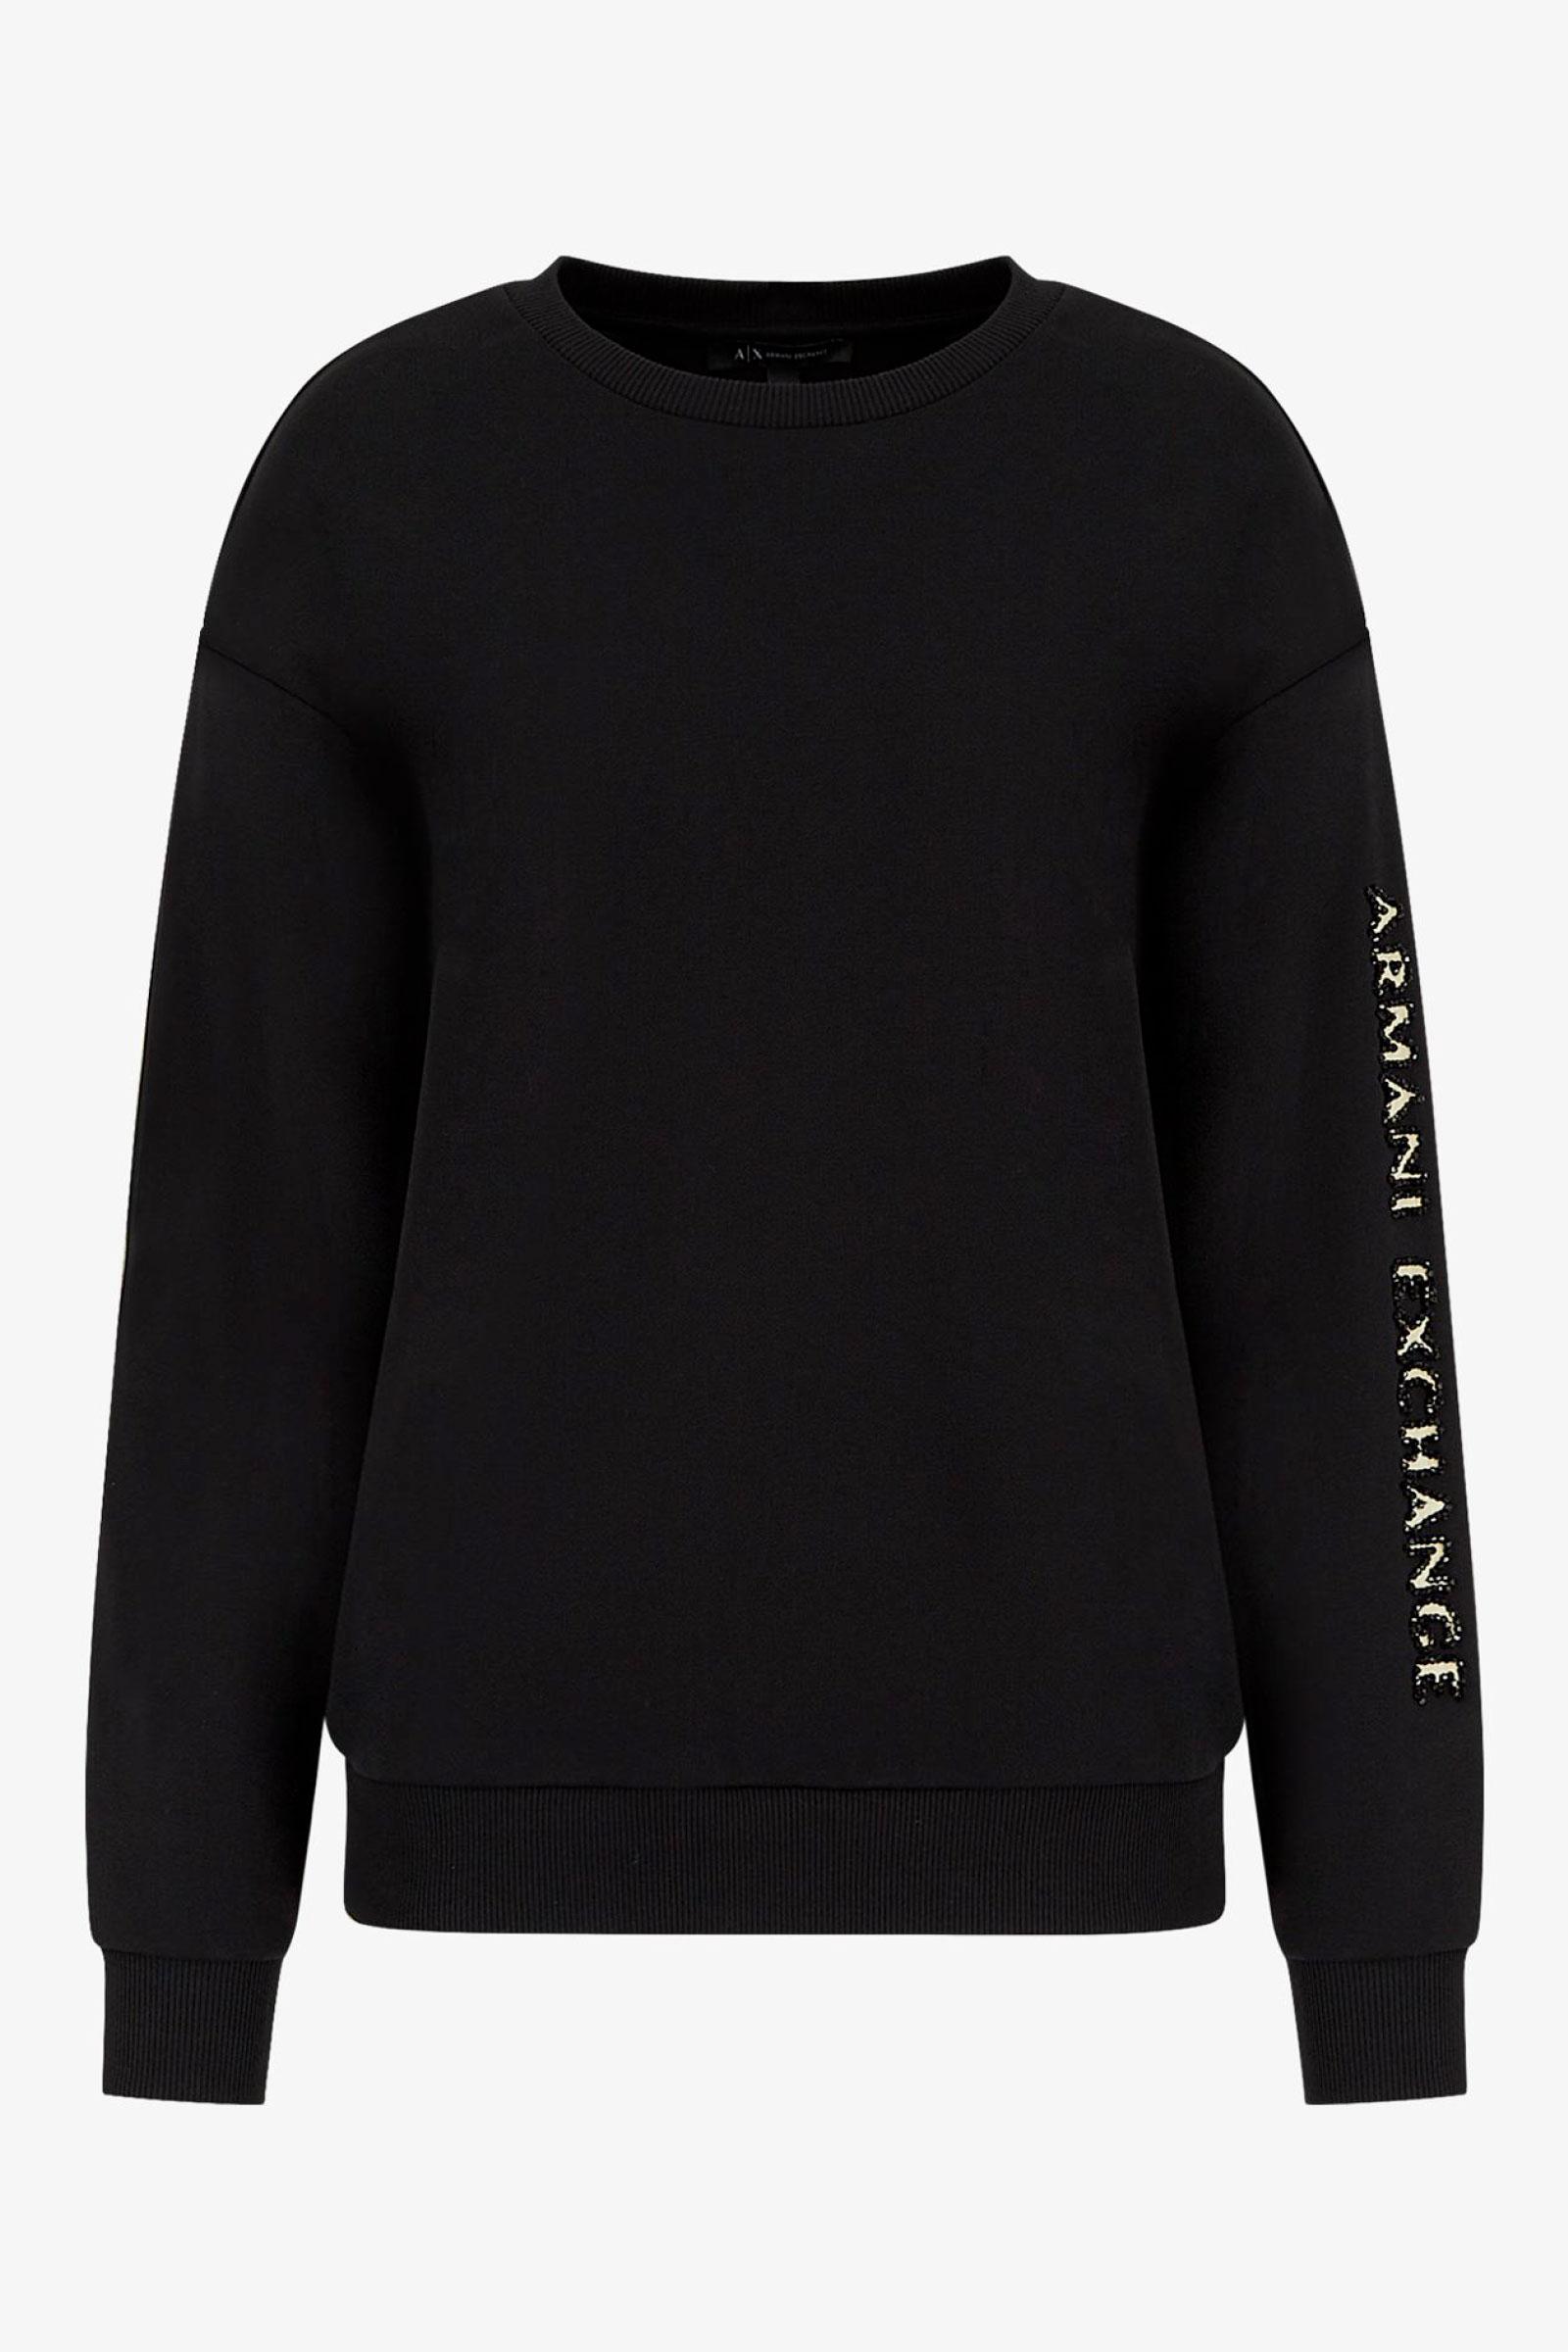 ARMANI EXCHANGE | Sweatshirt | 6KYM48 YJ6PZ1200